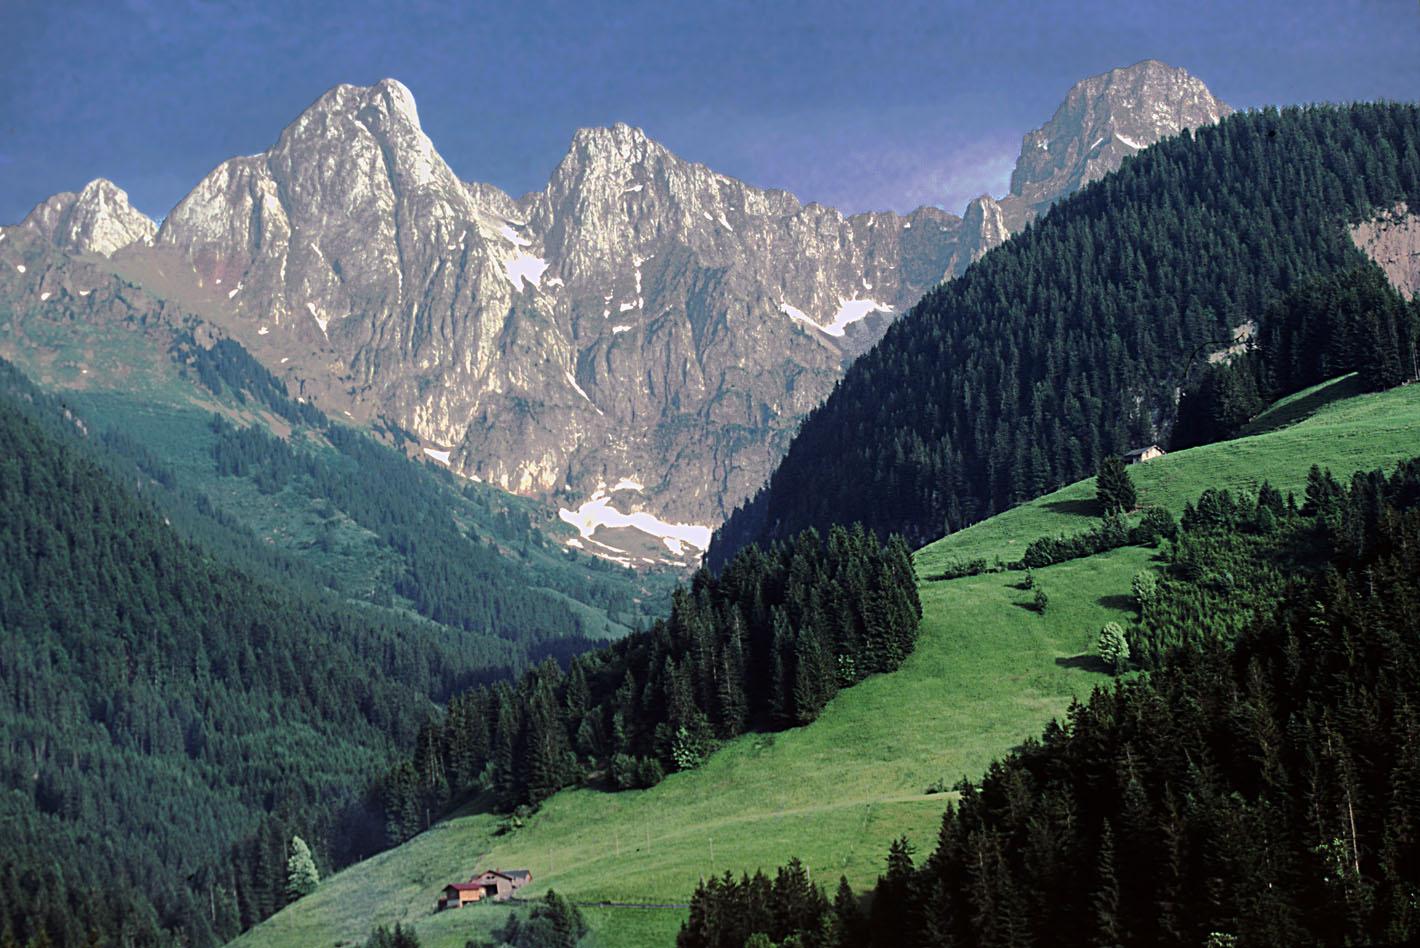 http://mstecker.com/images/Europe/Switzerland/Switzerlandphotos/a8switz2a.jpg